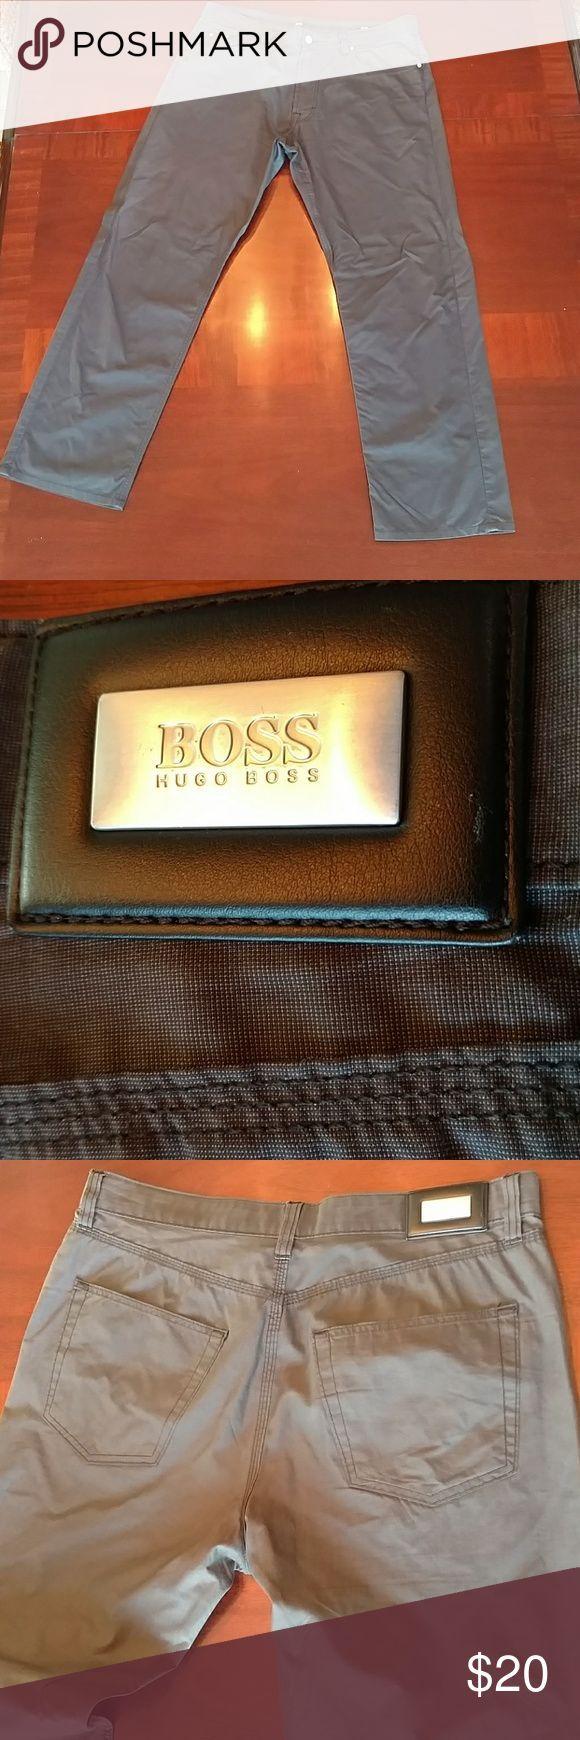 Hugo Boss  chinos 38/32 These look brand new. They are a grey straight leg Chino. Hugo Boss Pants Chinos & Khakis